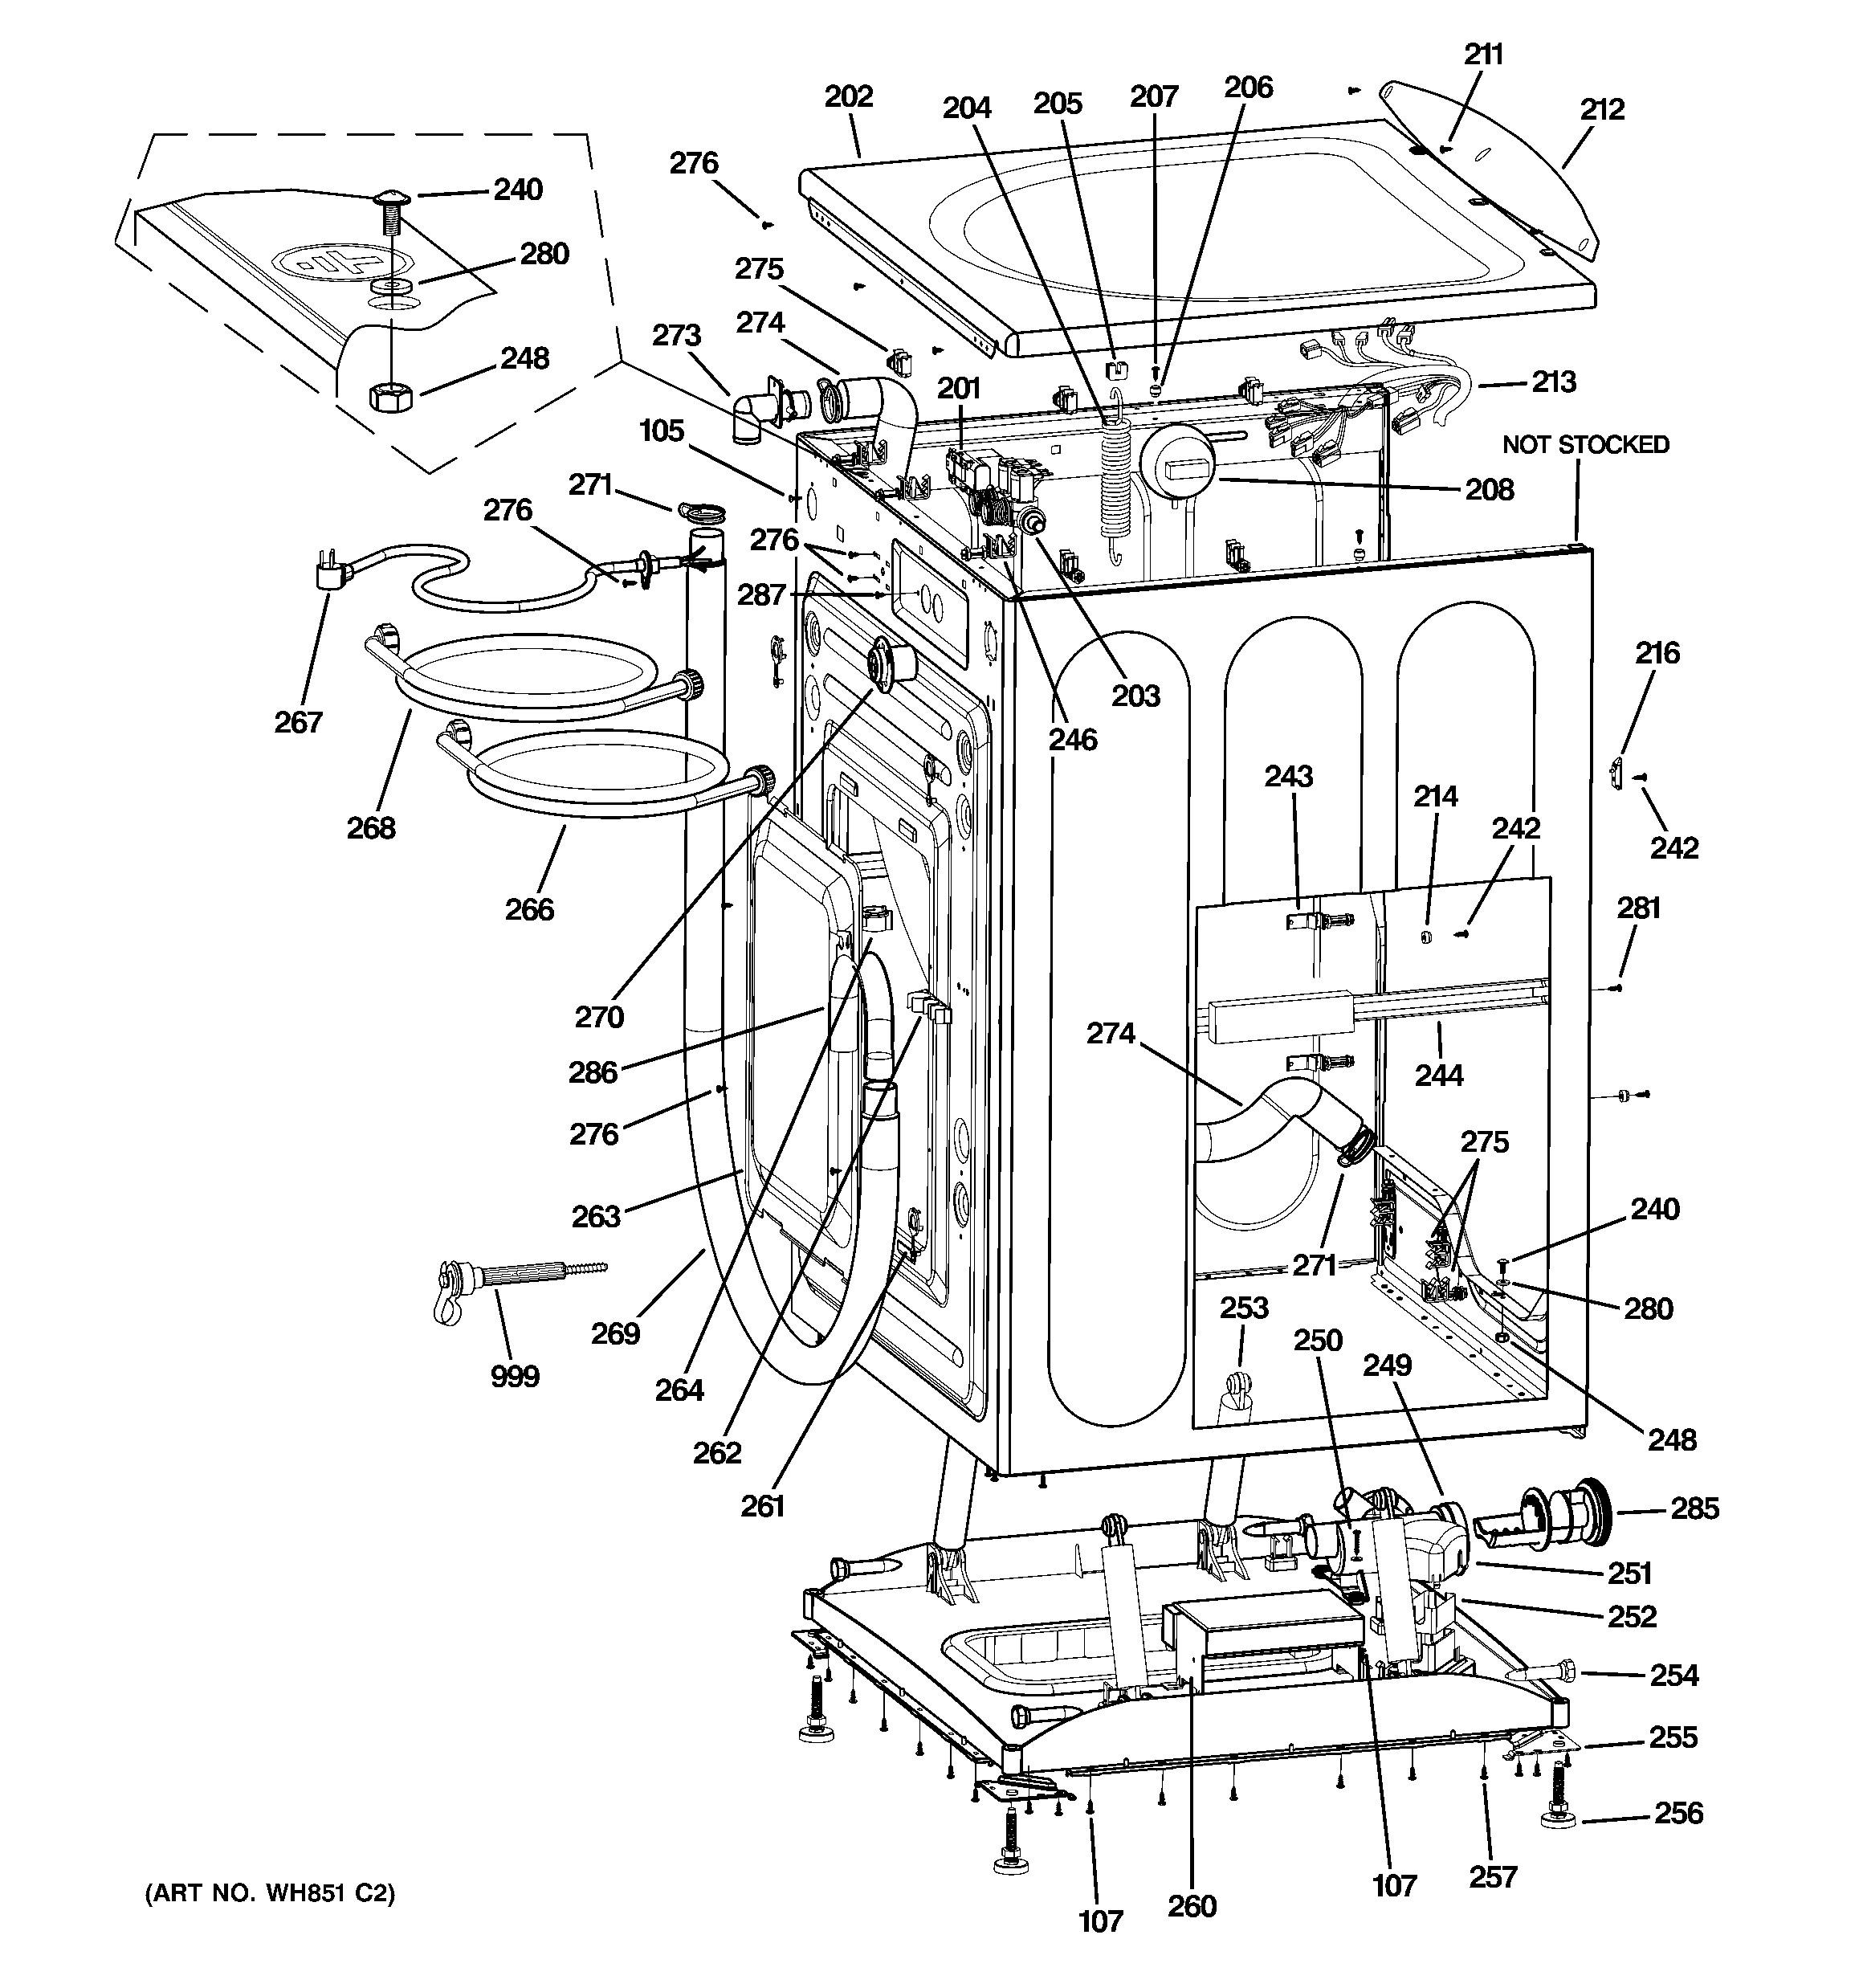 Front Suspension Diagram Ge Washer Parts Model Wcvh6600h1ww Of Front Suspension Diagram